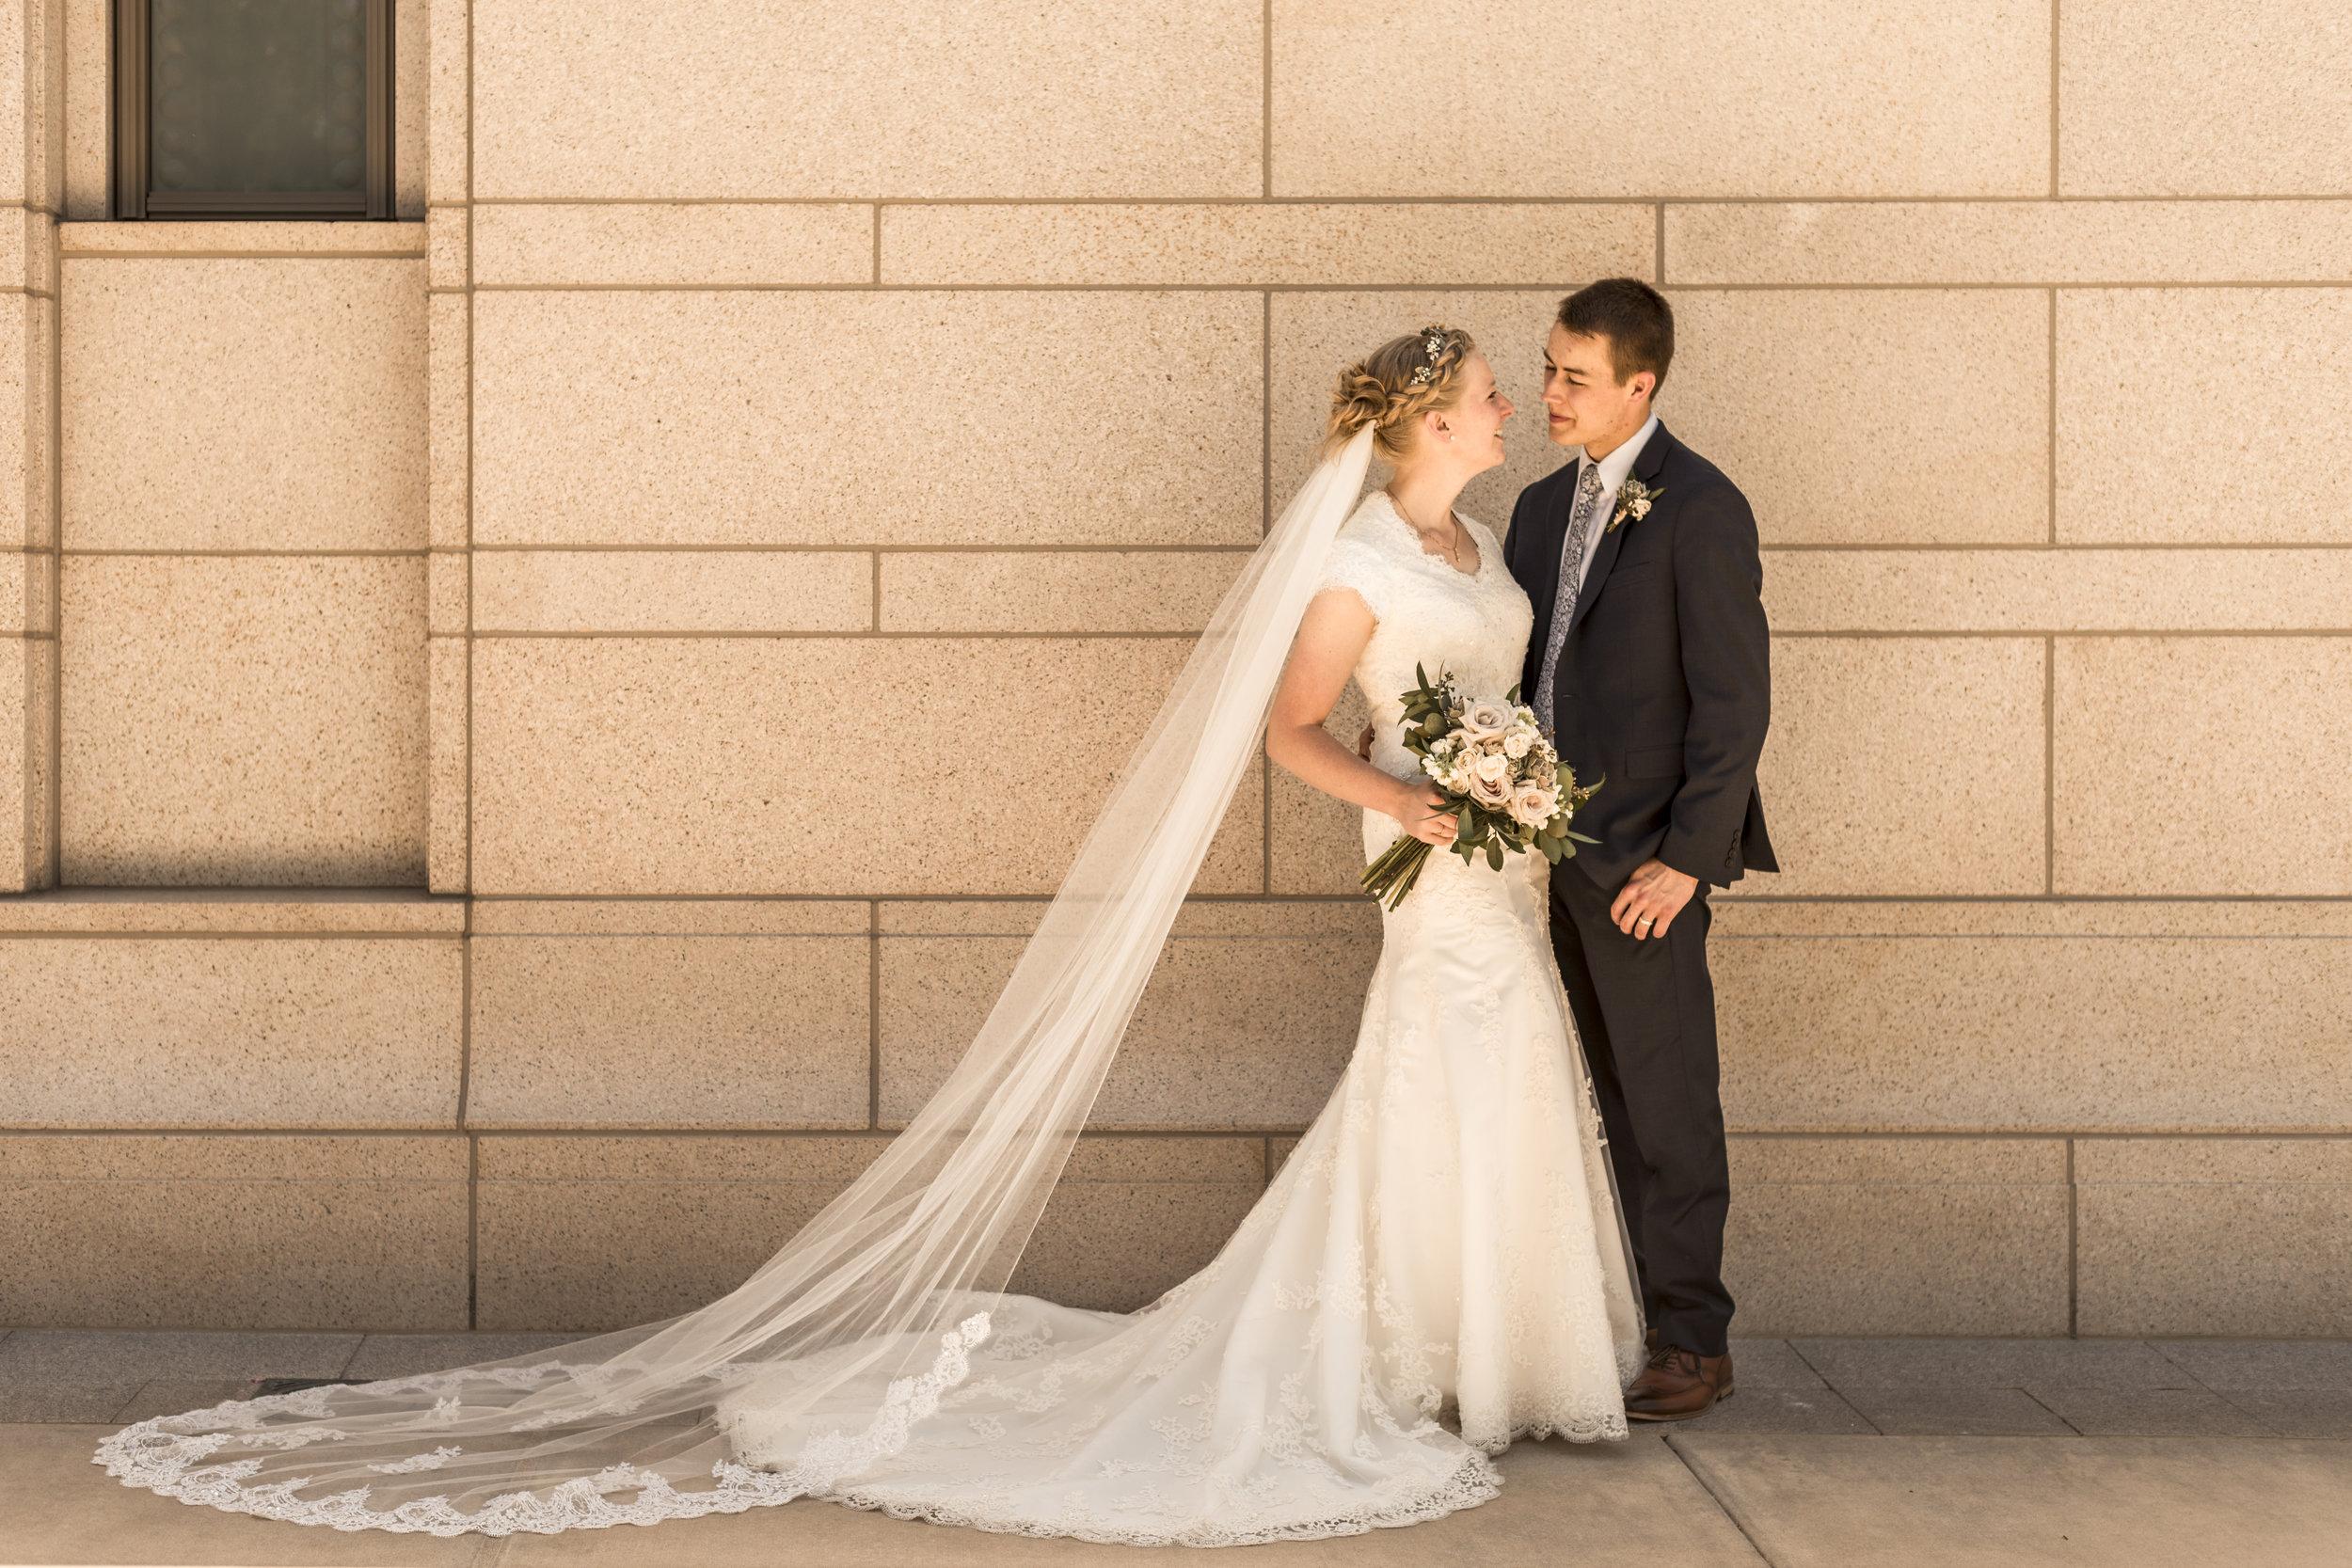 LDS Summer Wedding | South Jordan, Utah Wedding Photographer| Bri Bergman Photography 07.JPG